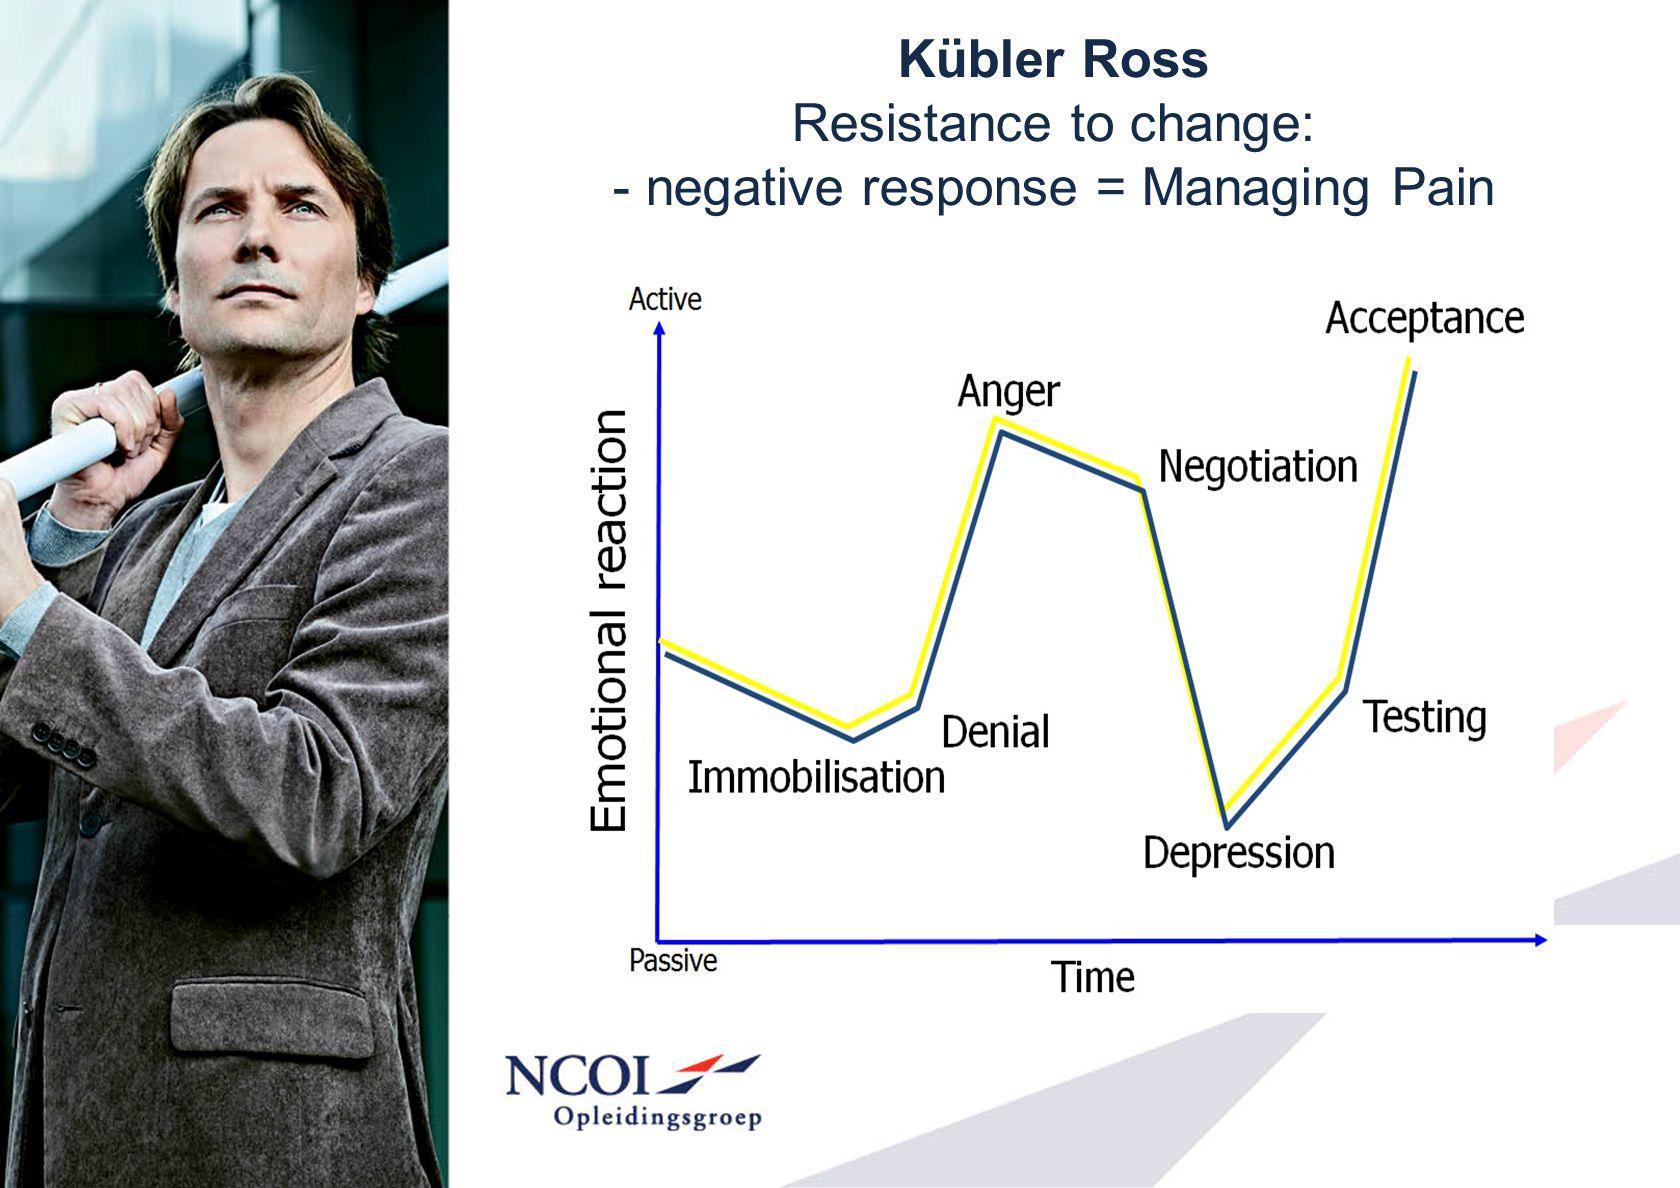 Kübler Ross Resistance to change: - negative response = Managing Pain